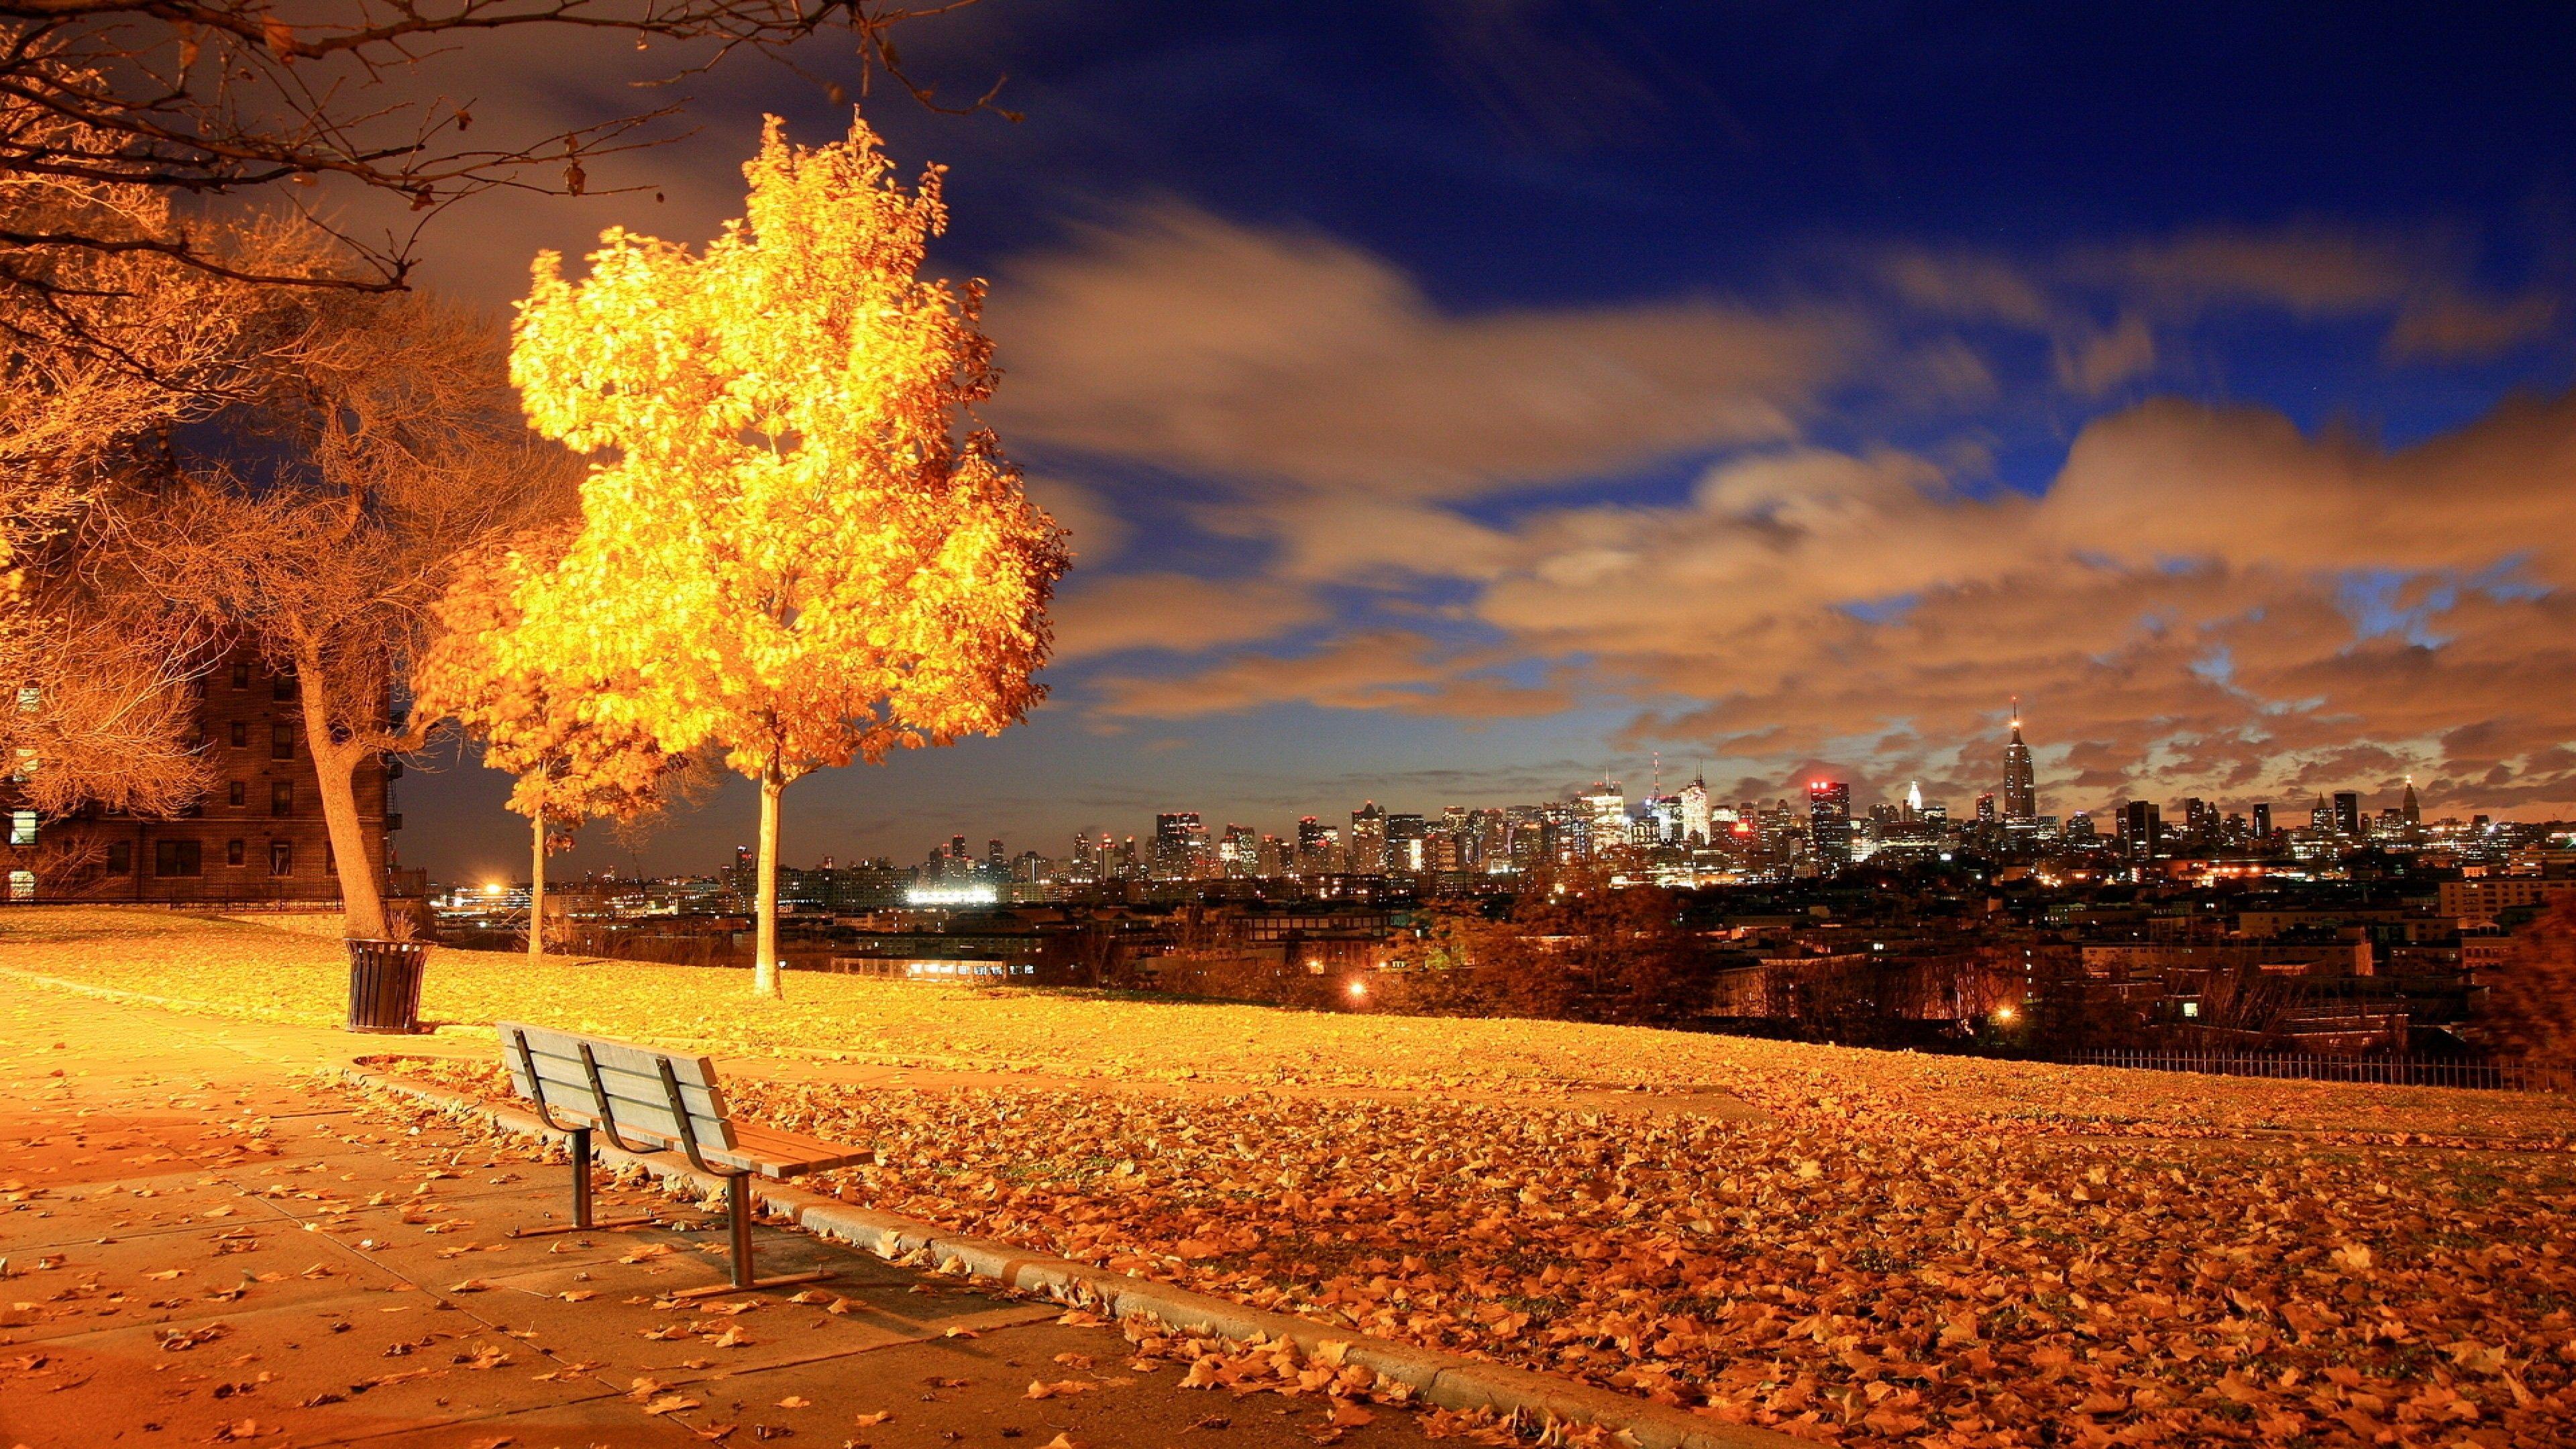 Candles On a Fall Night Desktop | Fall Desktop Background ...